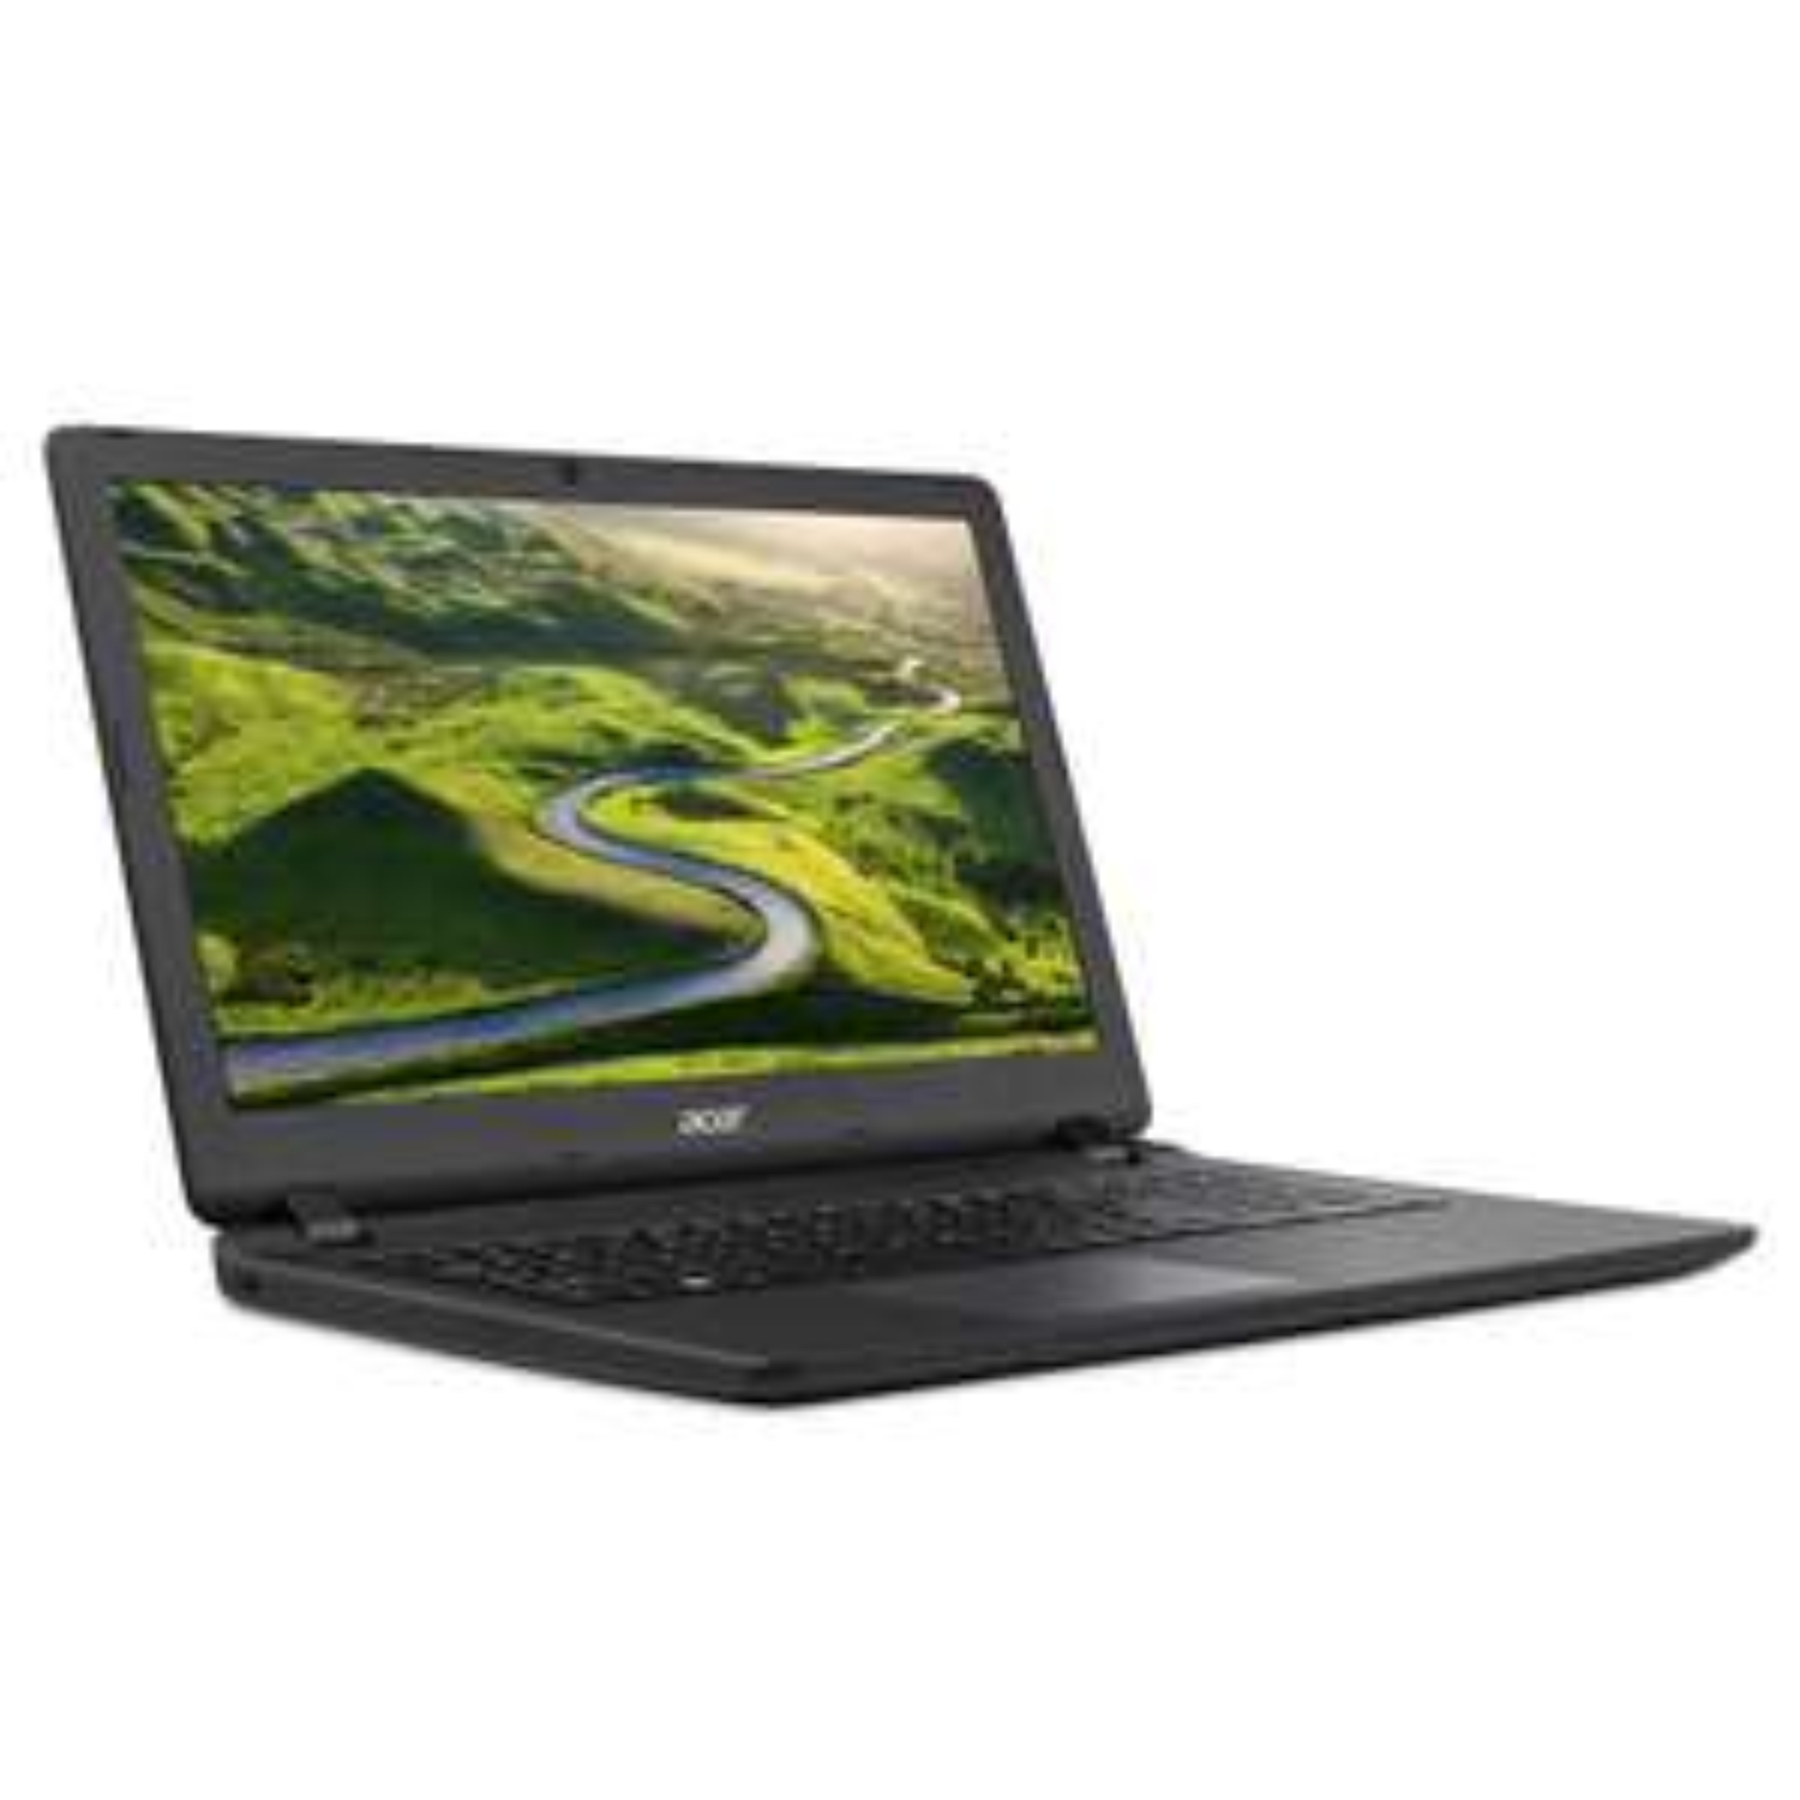 Acer Aspire ES1-572 mit Core i3-6100U, 8GB RAM, 256 GB SSD, 15,6 Zoll Full-HD für 429€ bei Notebooksbilliger